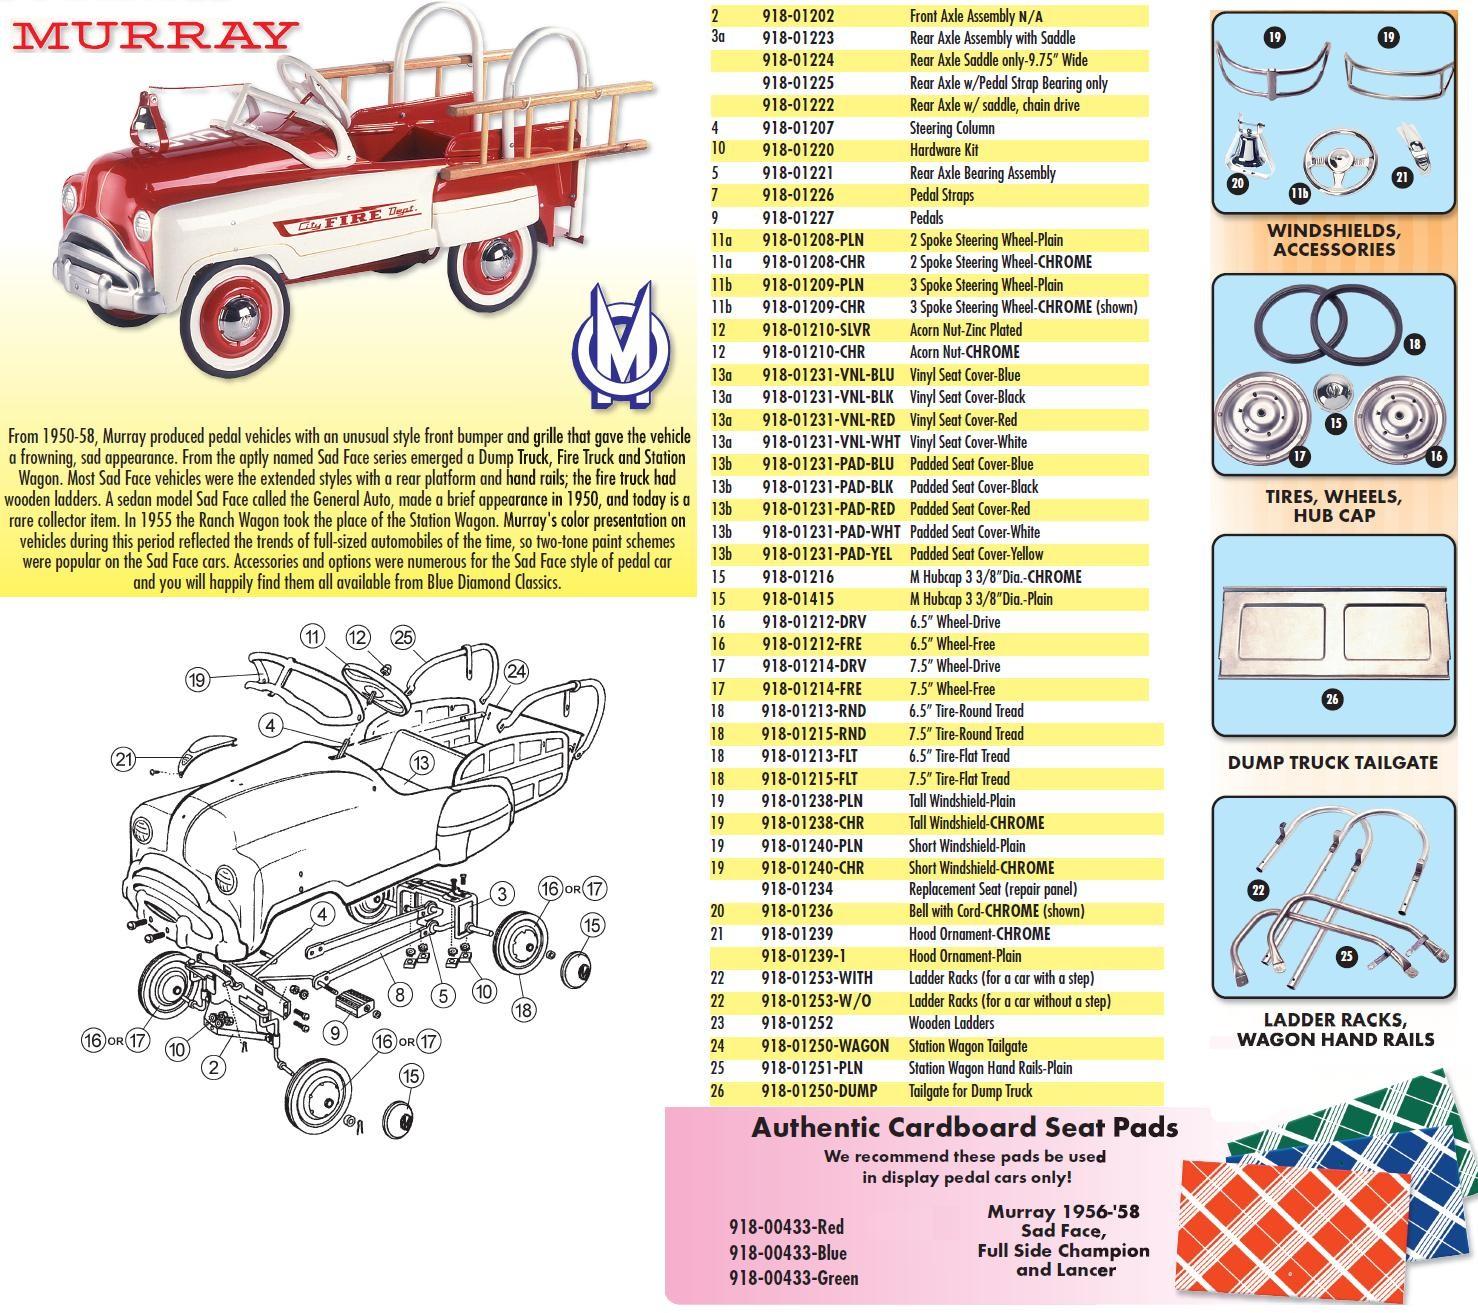 Fire Truck Parts Diagram Pedal Car Parts Murray Acorn Nut Of Fire Truck Parts Diagram